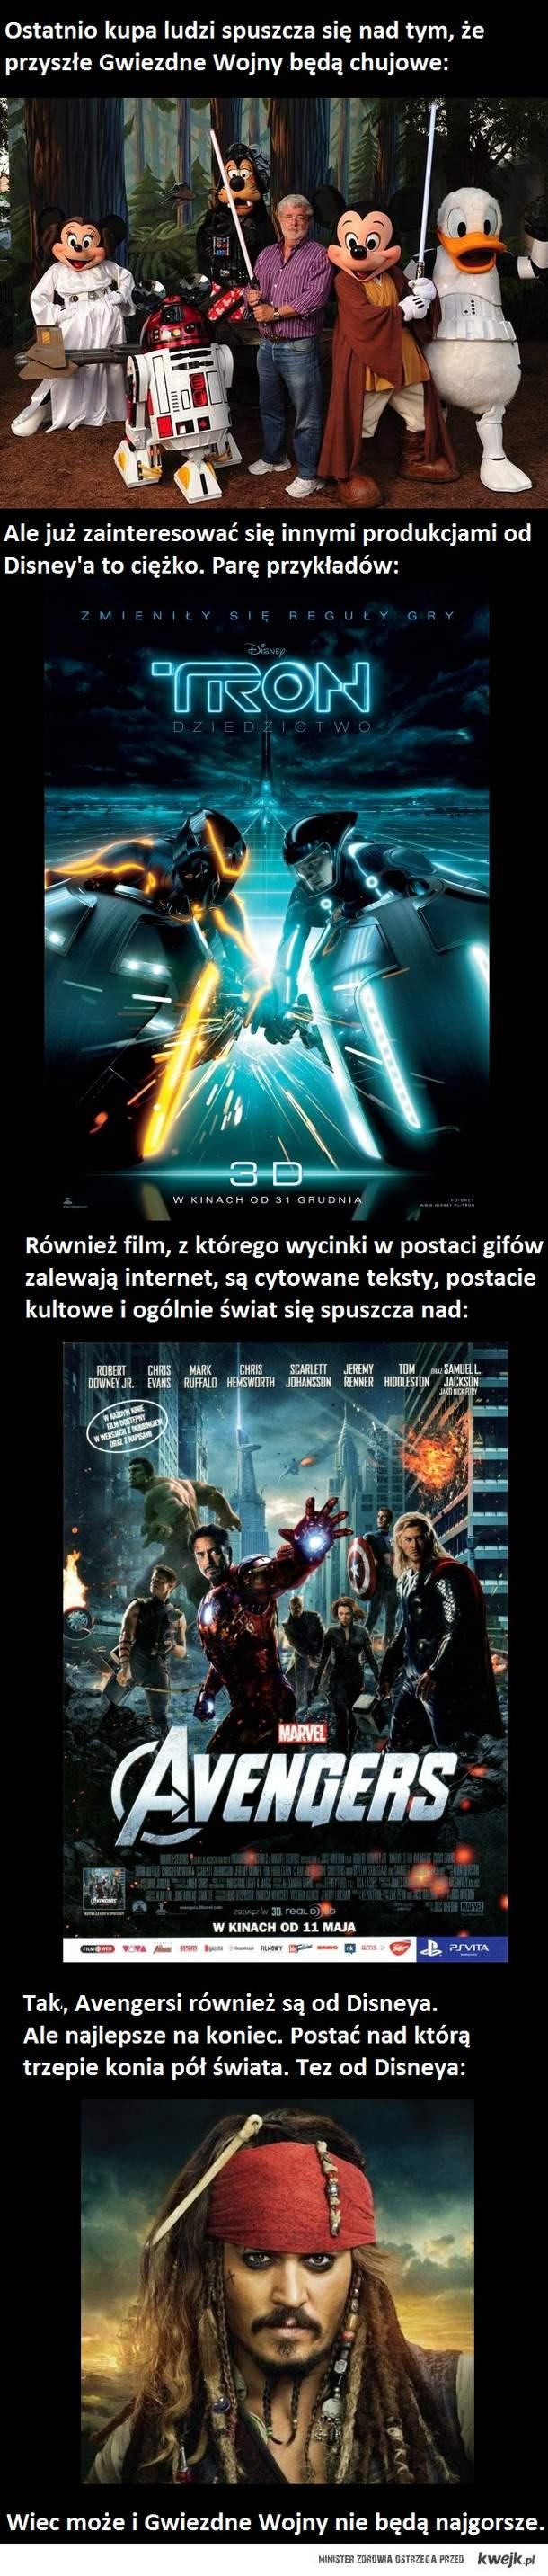 Star Wars od Disneya